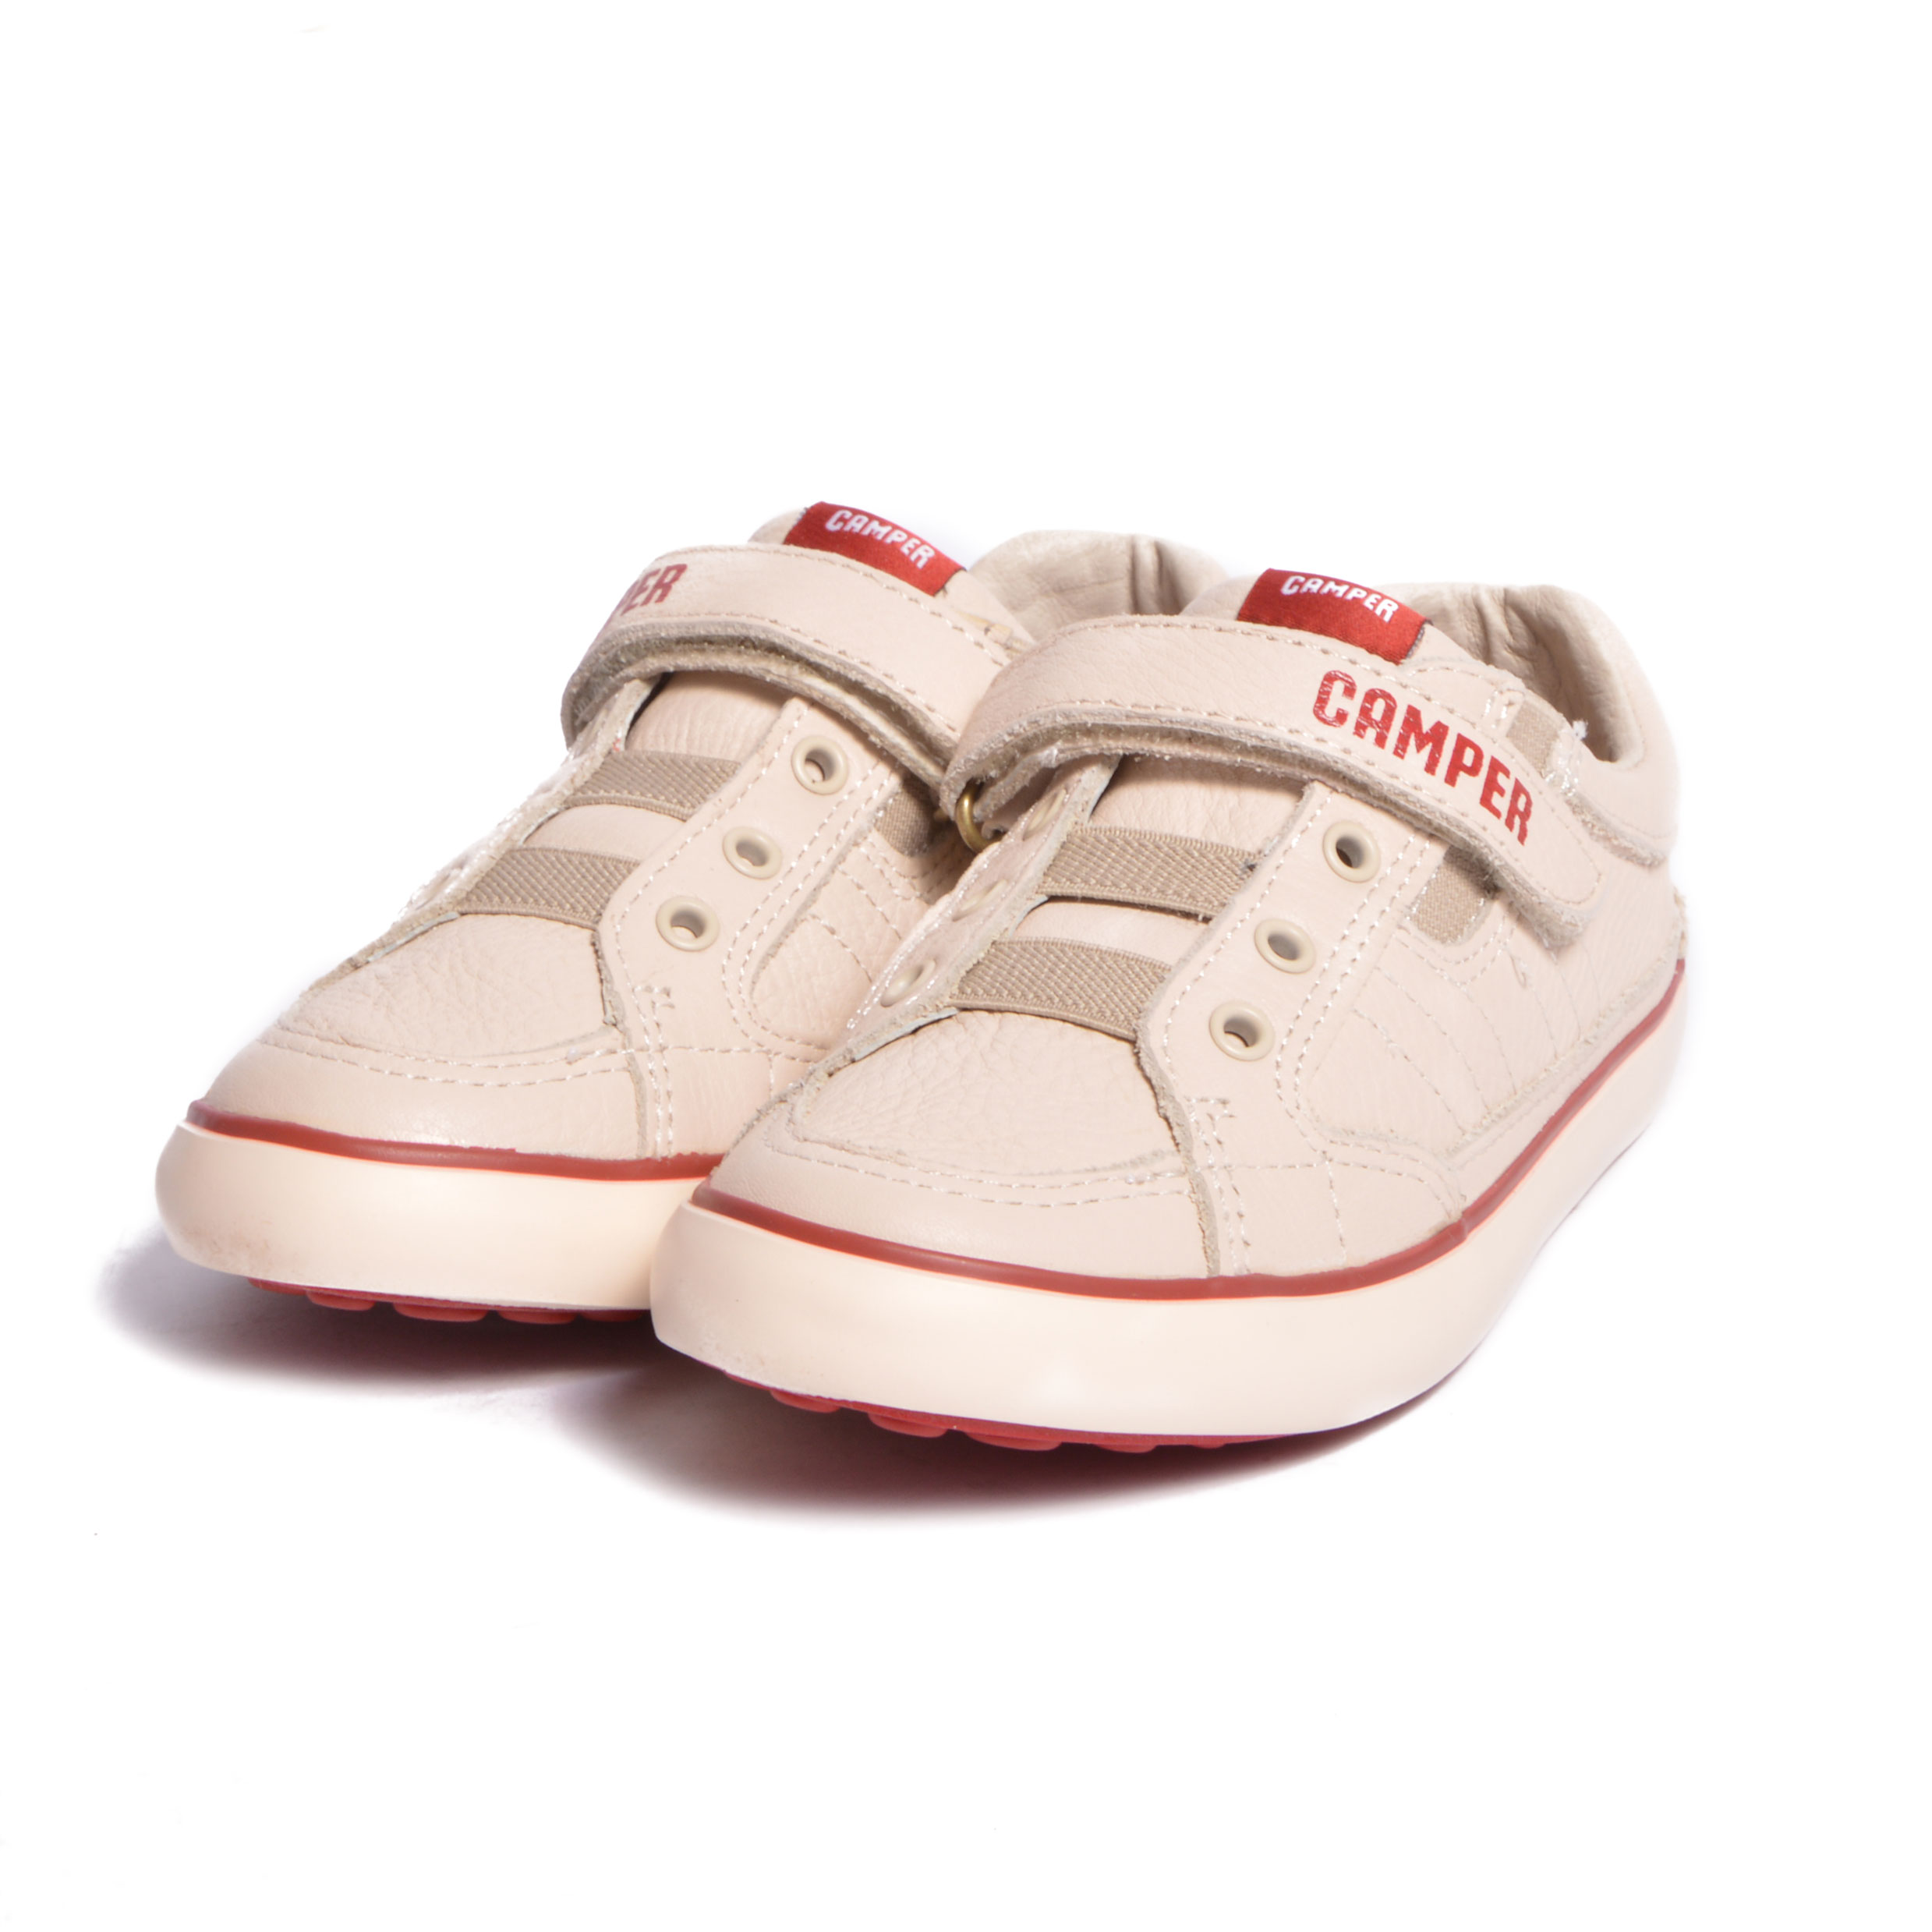 Geox scarpe Annunci in tutta Italia Kijiji: Annunci di eBay